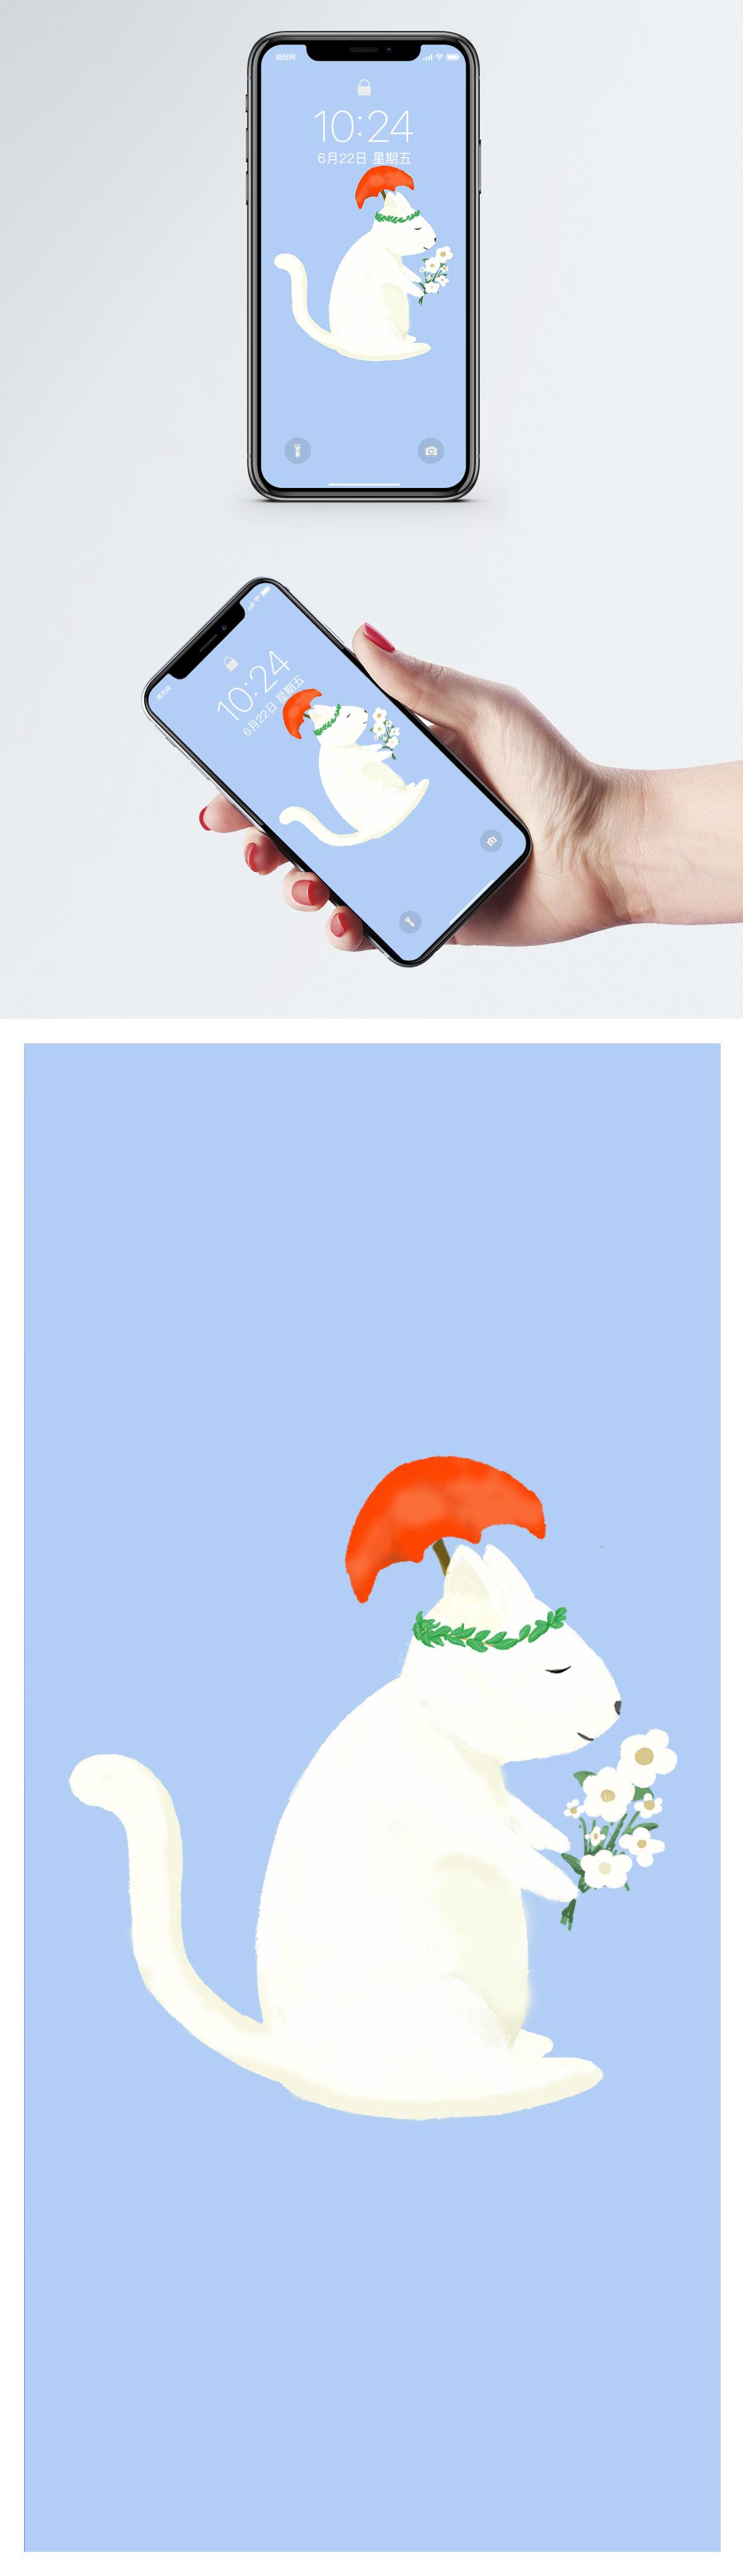 Cartoon Cat Mobile Wallpaper Backgrounds Images Free Download 400387012 Lovepik Com